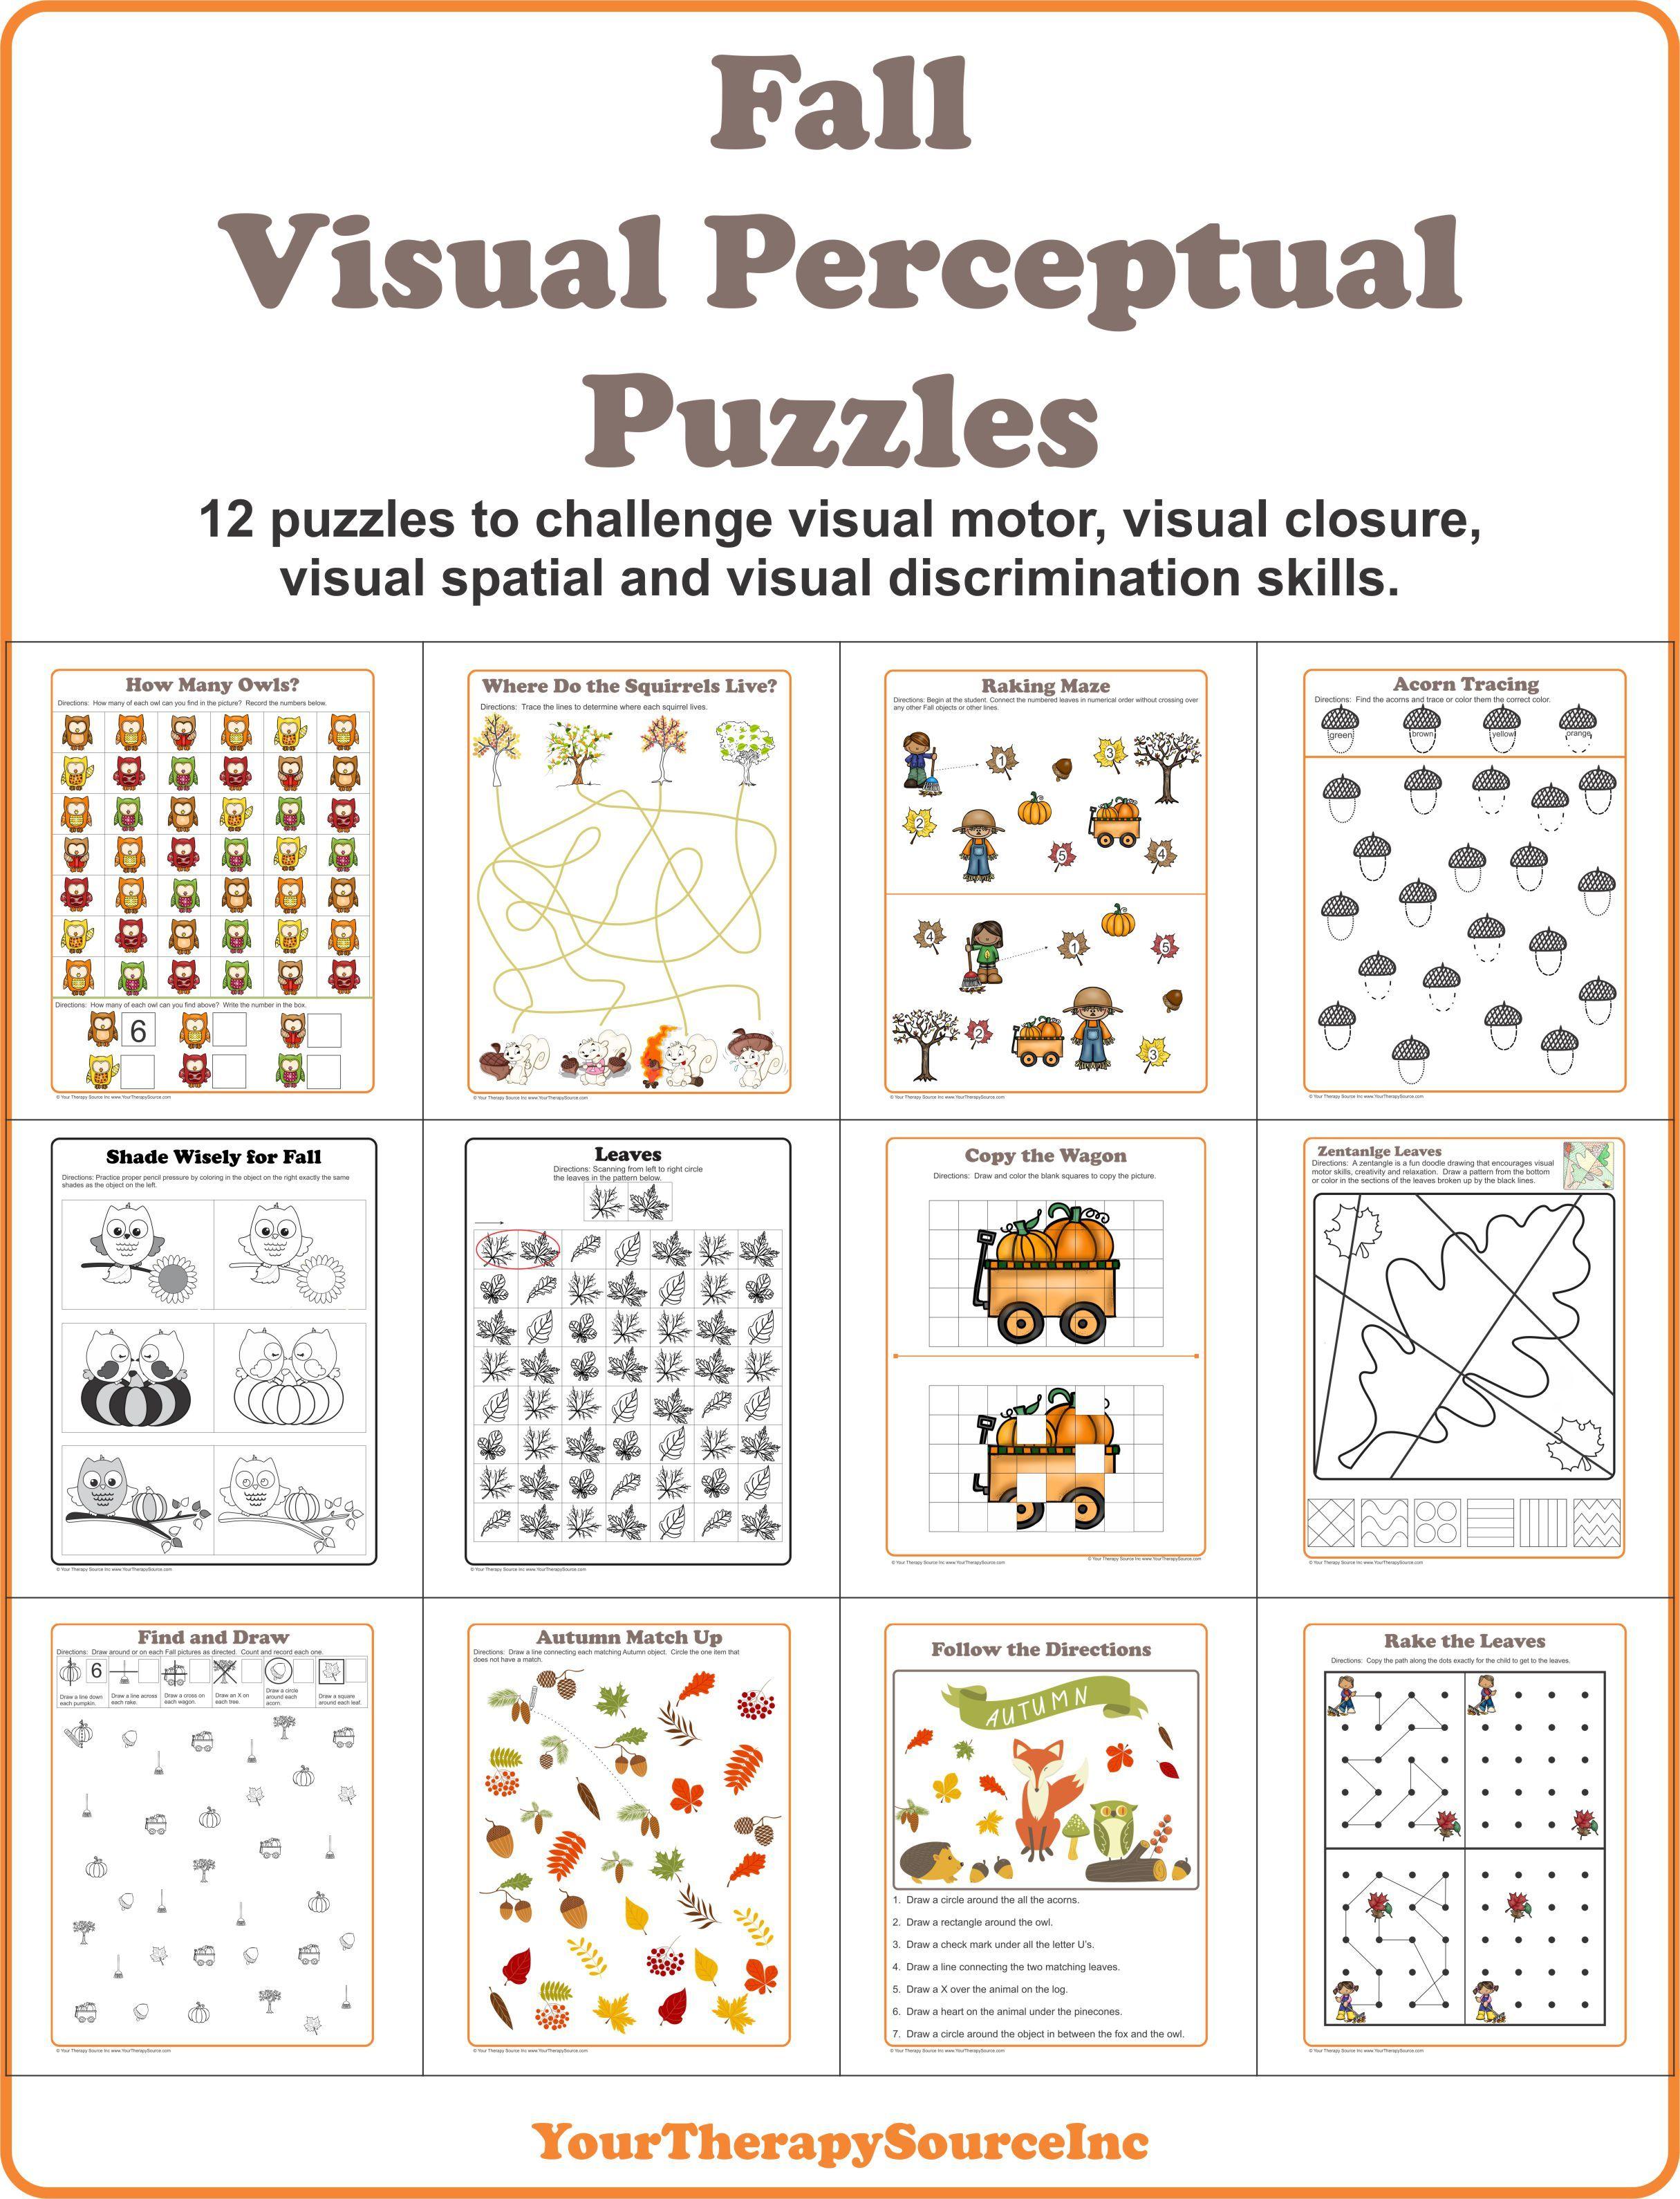 Fall Visual Perceptual Puzzles To Challenge Visual Motor Visual Spatial Visual Discrimination